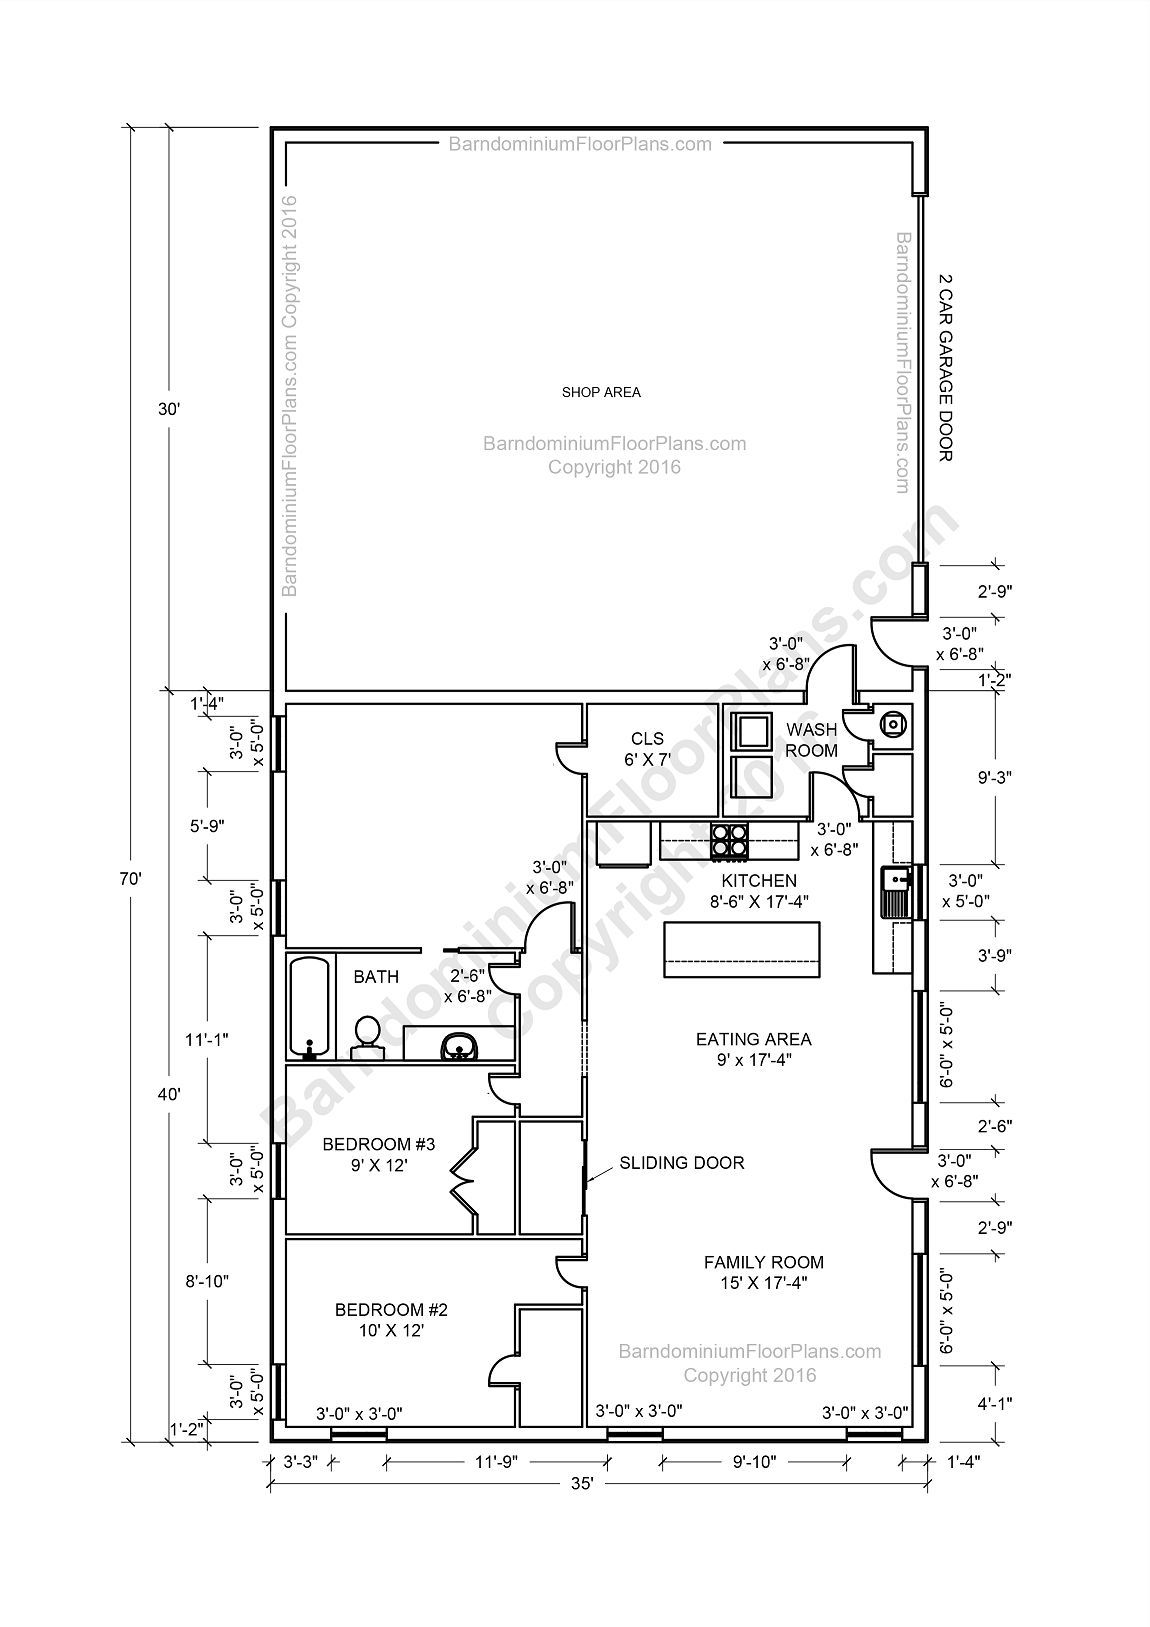 Barndominium Floor Plans With Breezeway Lshapedbarndominiumfloorplans Barndominium Plans Shop House Plans Pole Barn House Plans